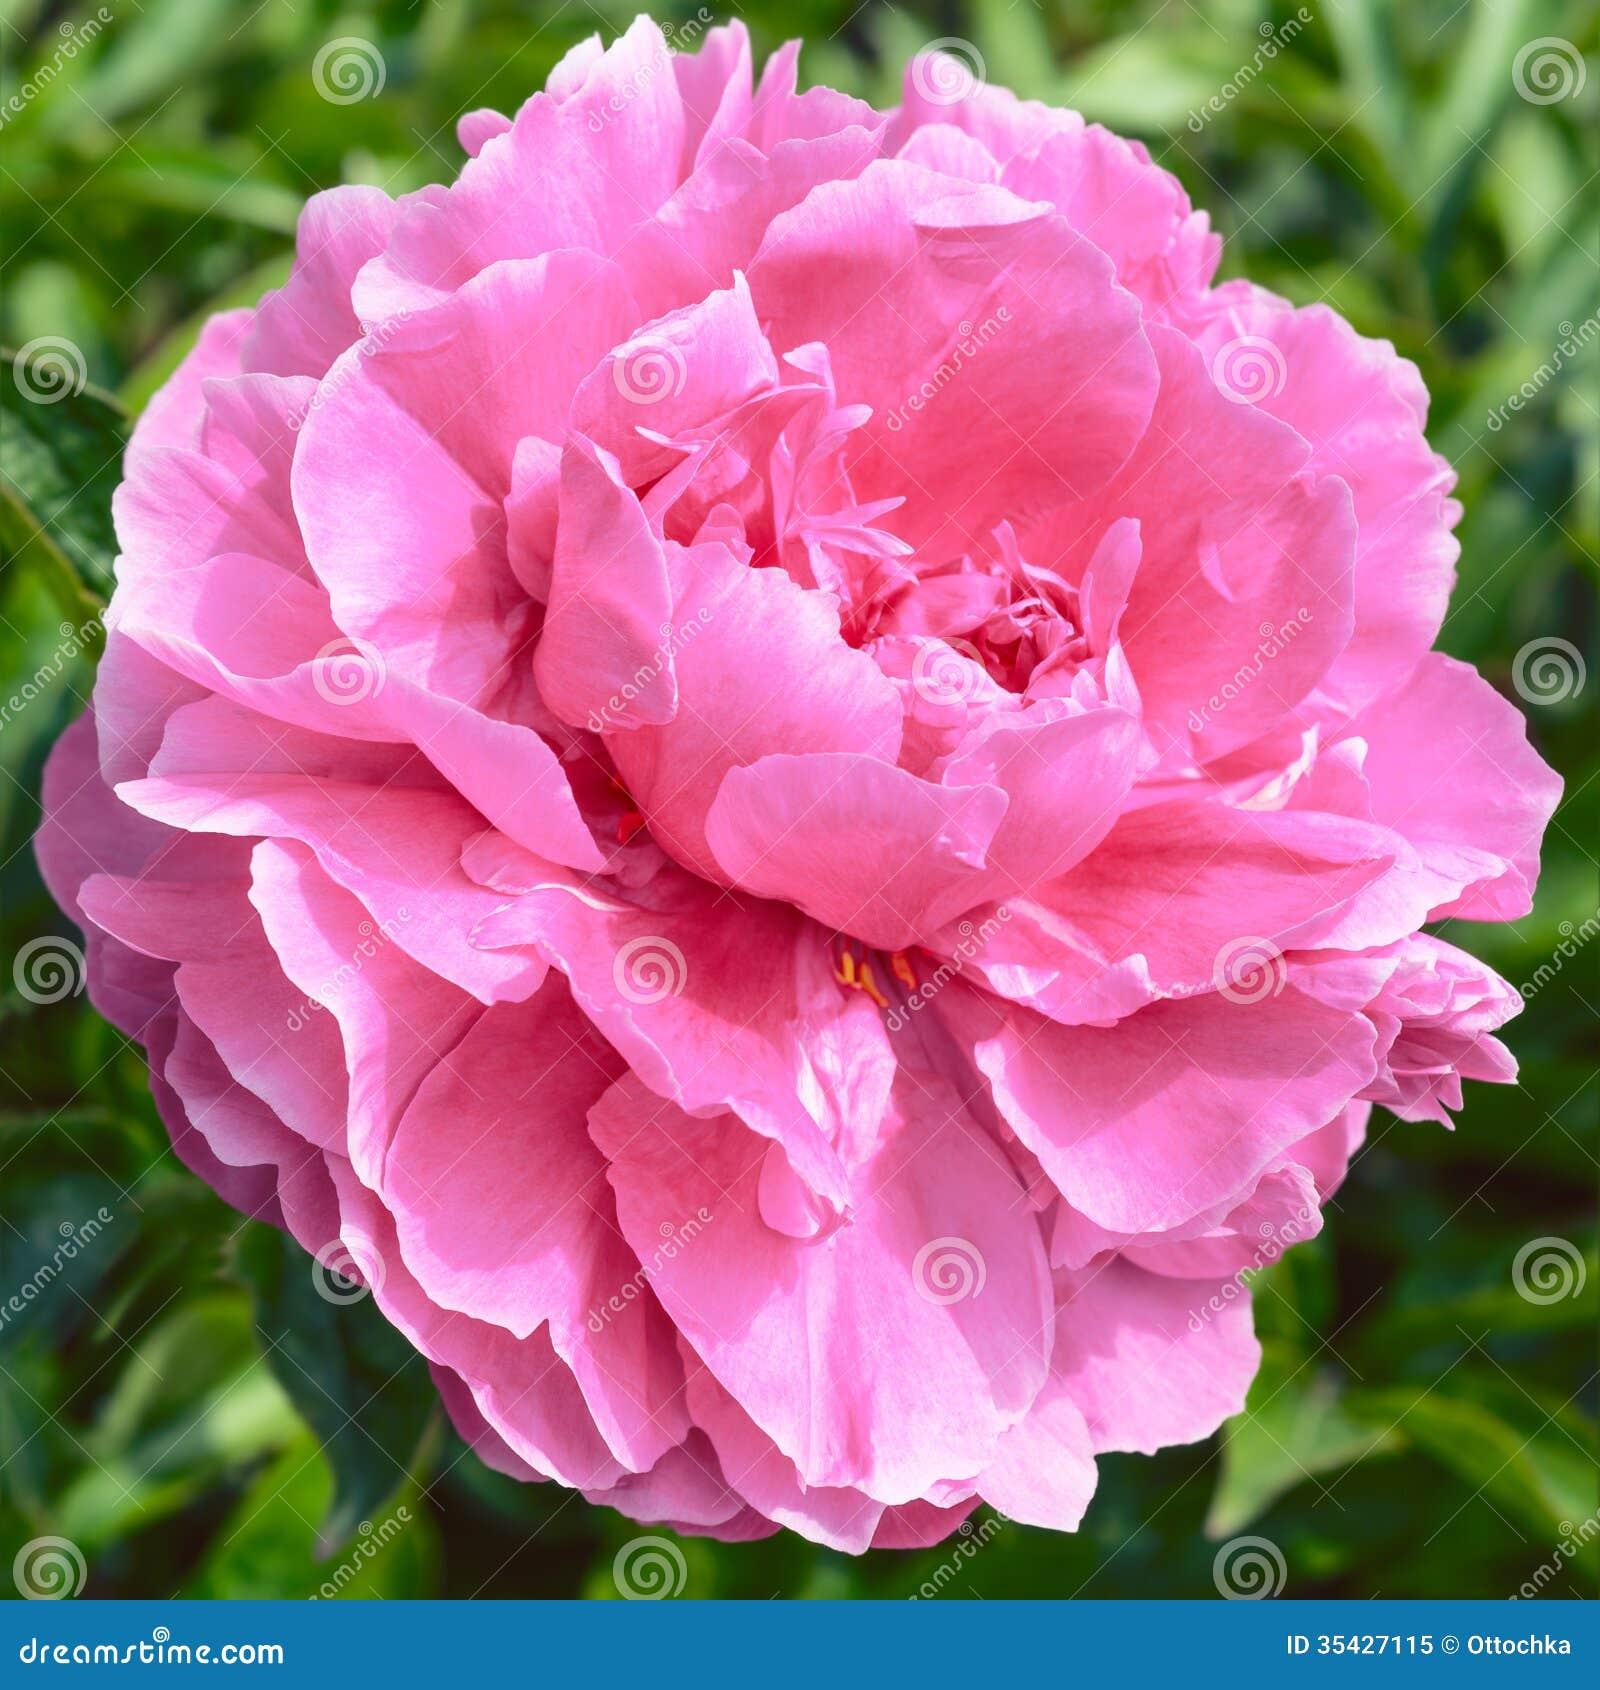 Pink peony flower stock image image of fresh summer 35427115 pink peony flower mightylinksfo